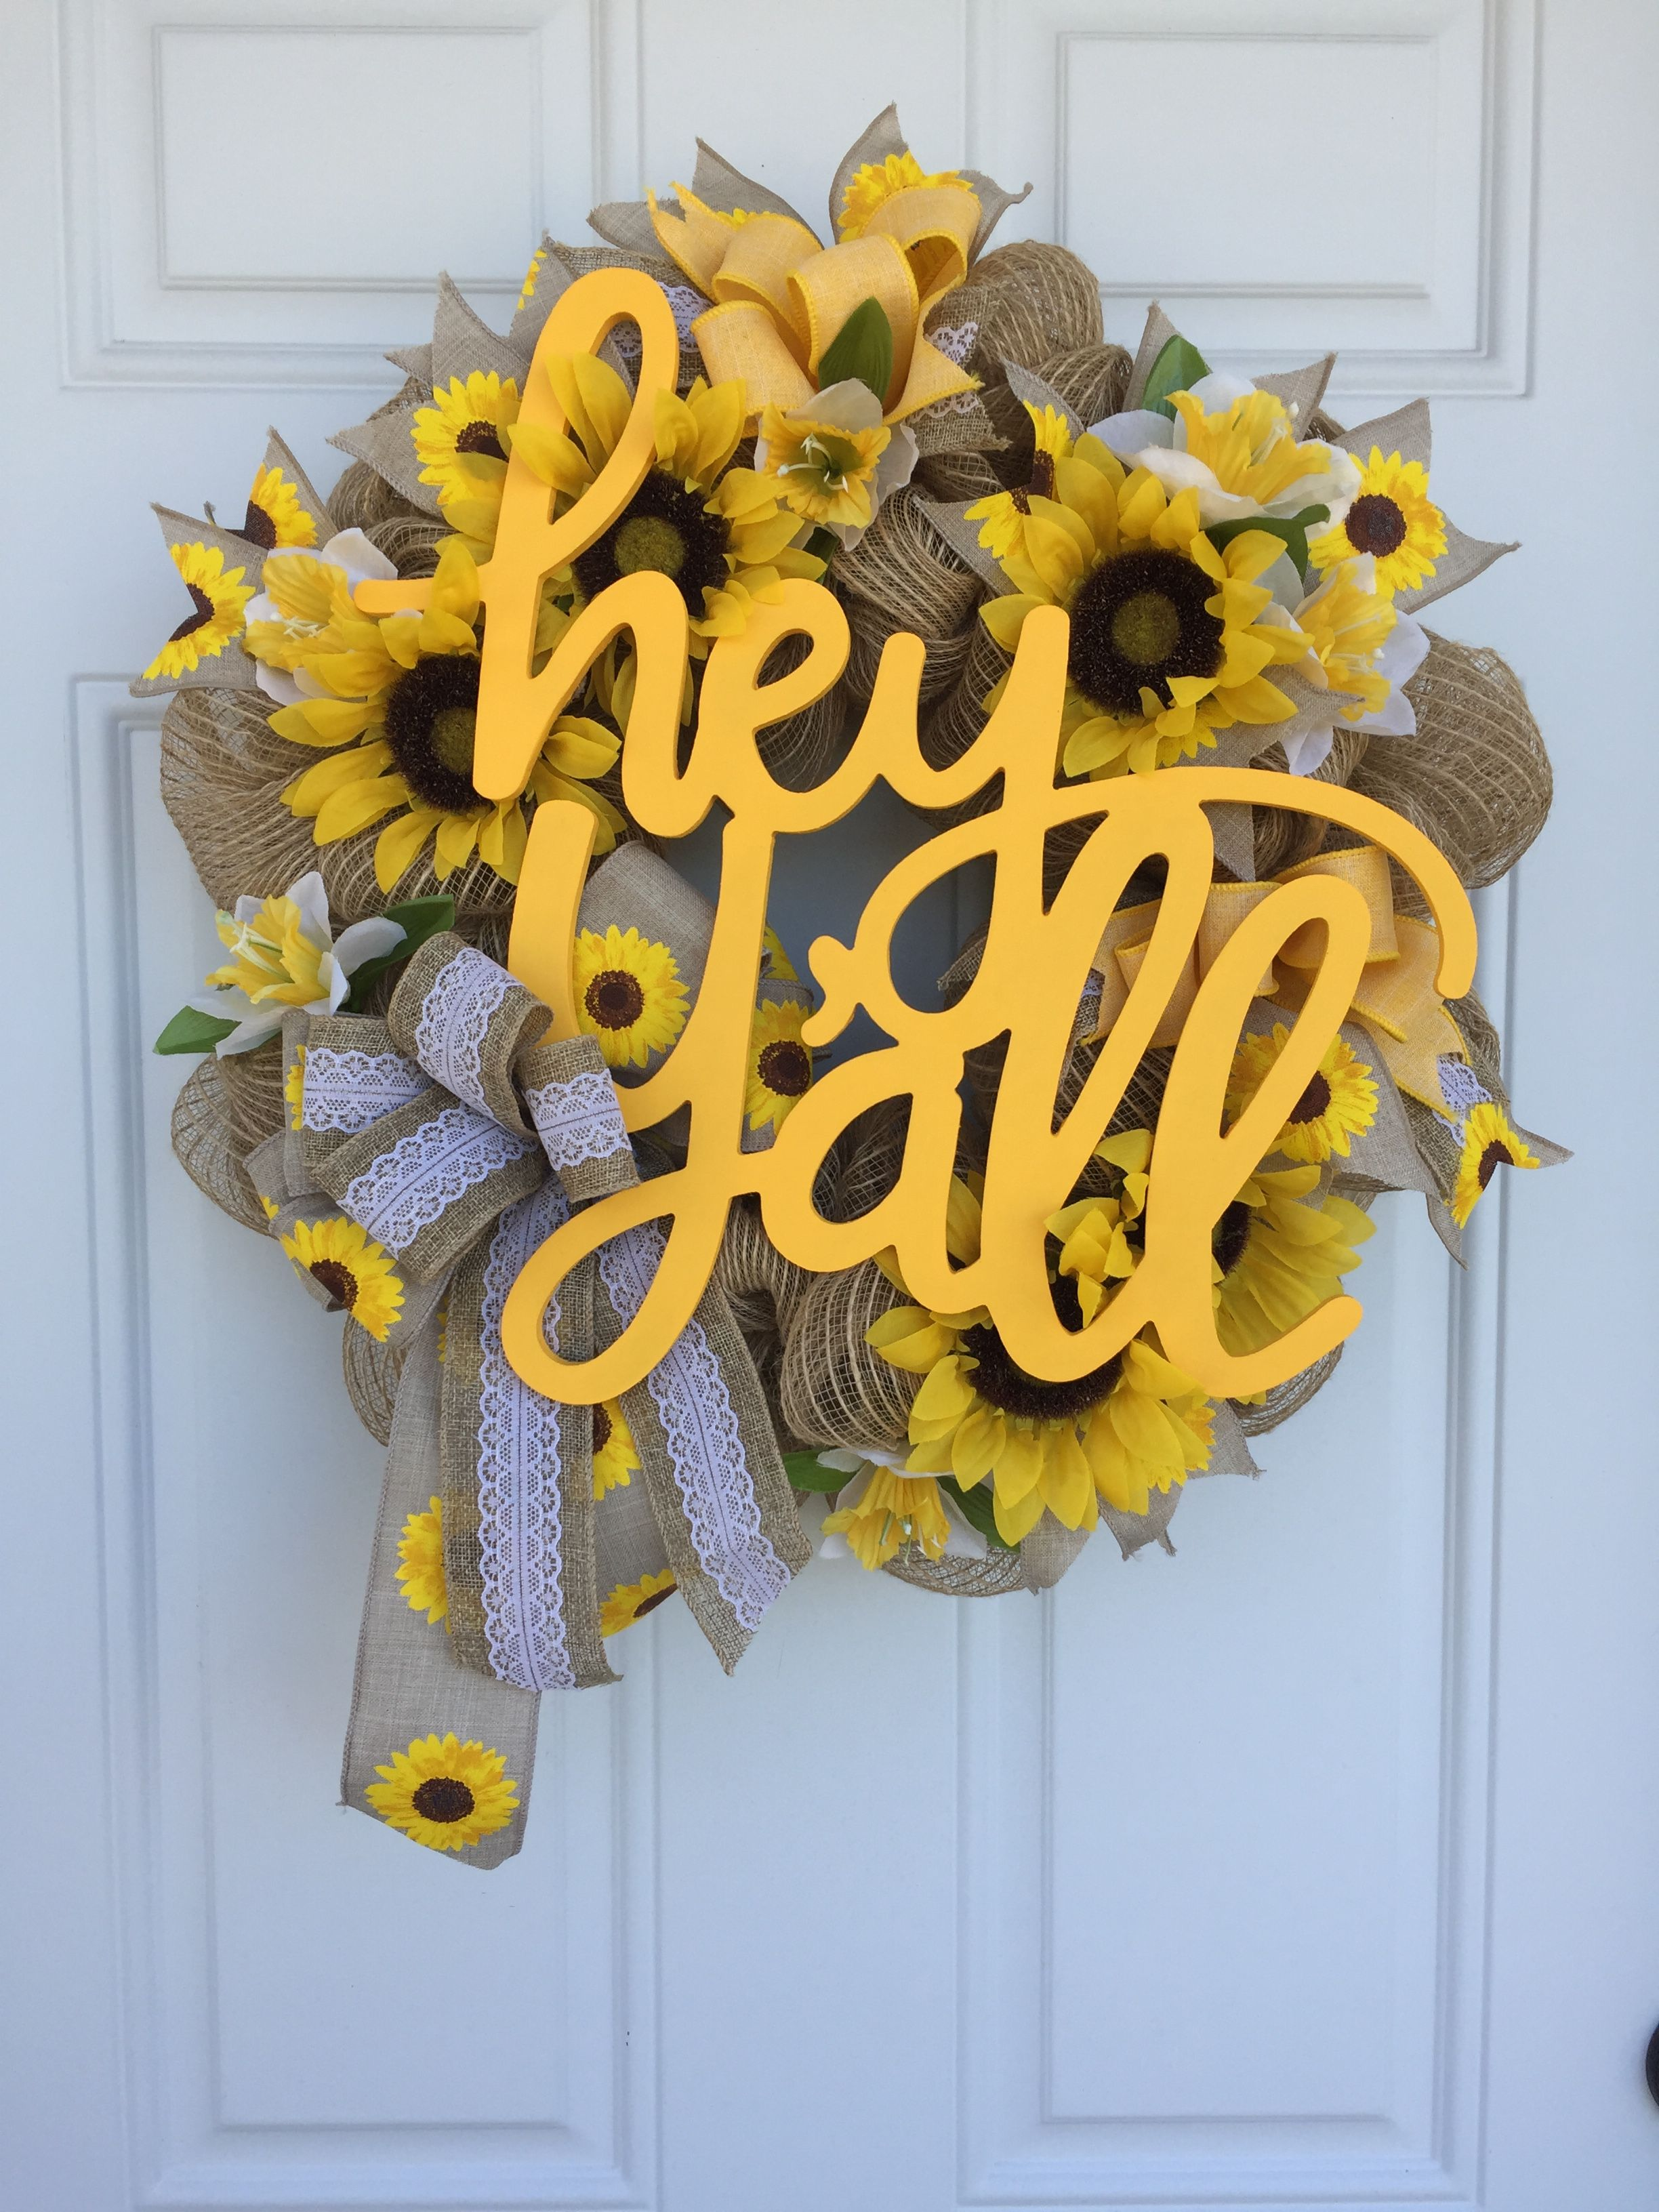 Photo of Hey her sunflower wreath. Custom design from Southern Sun Designs.